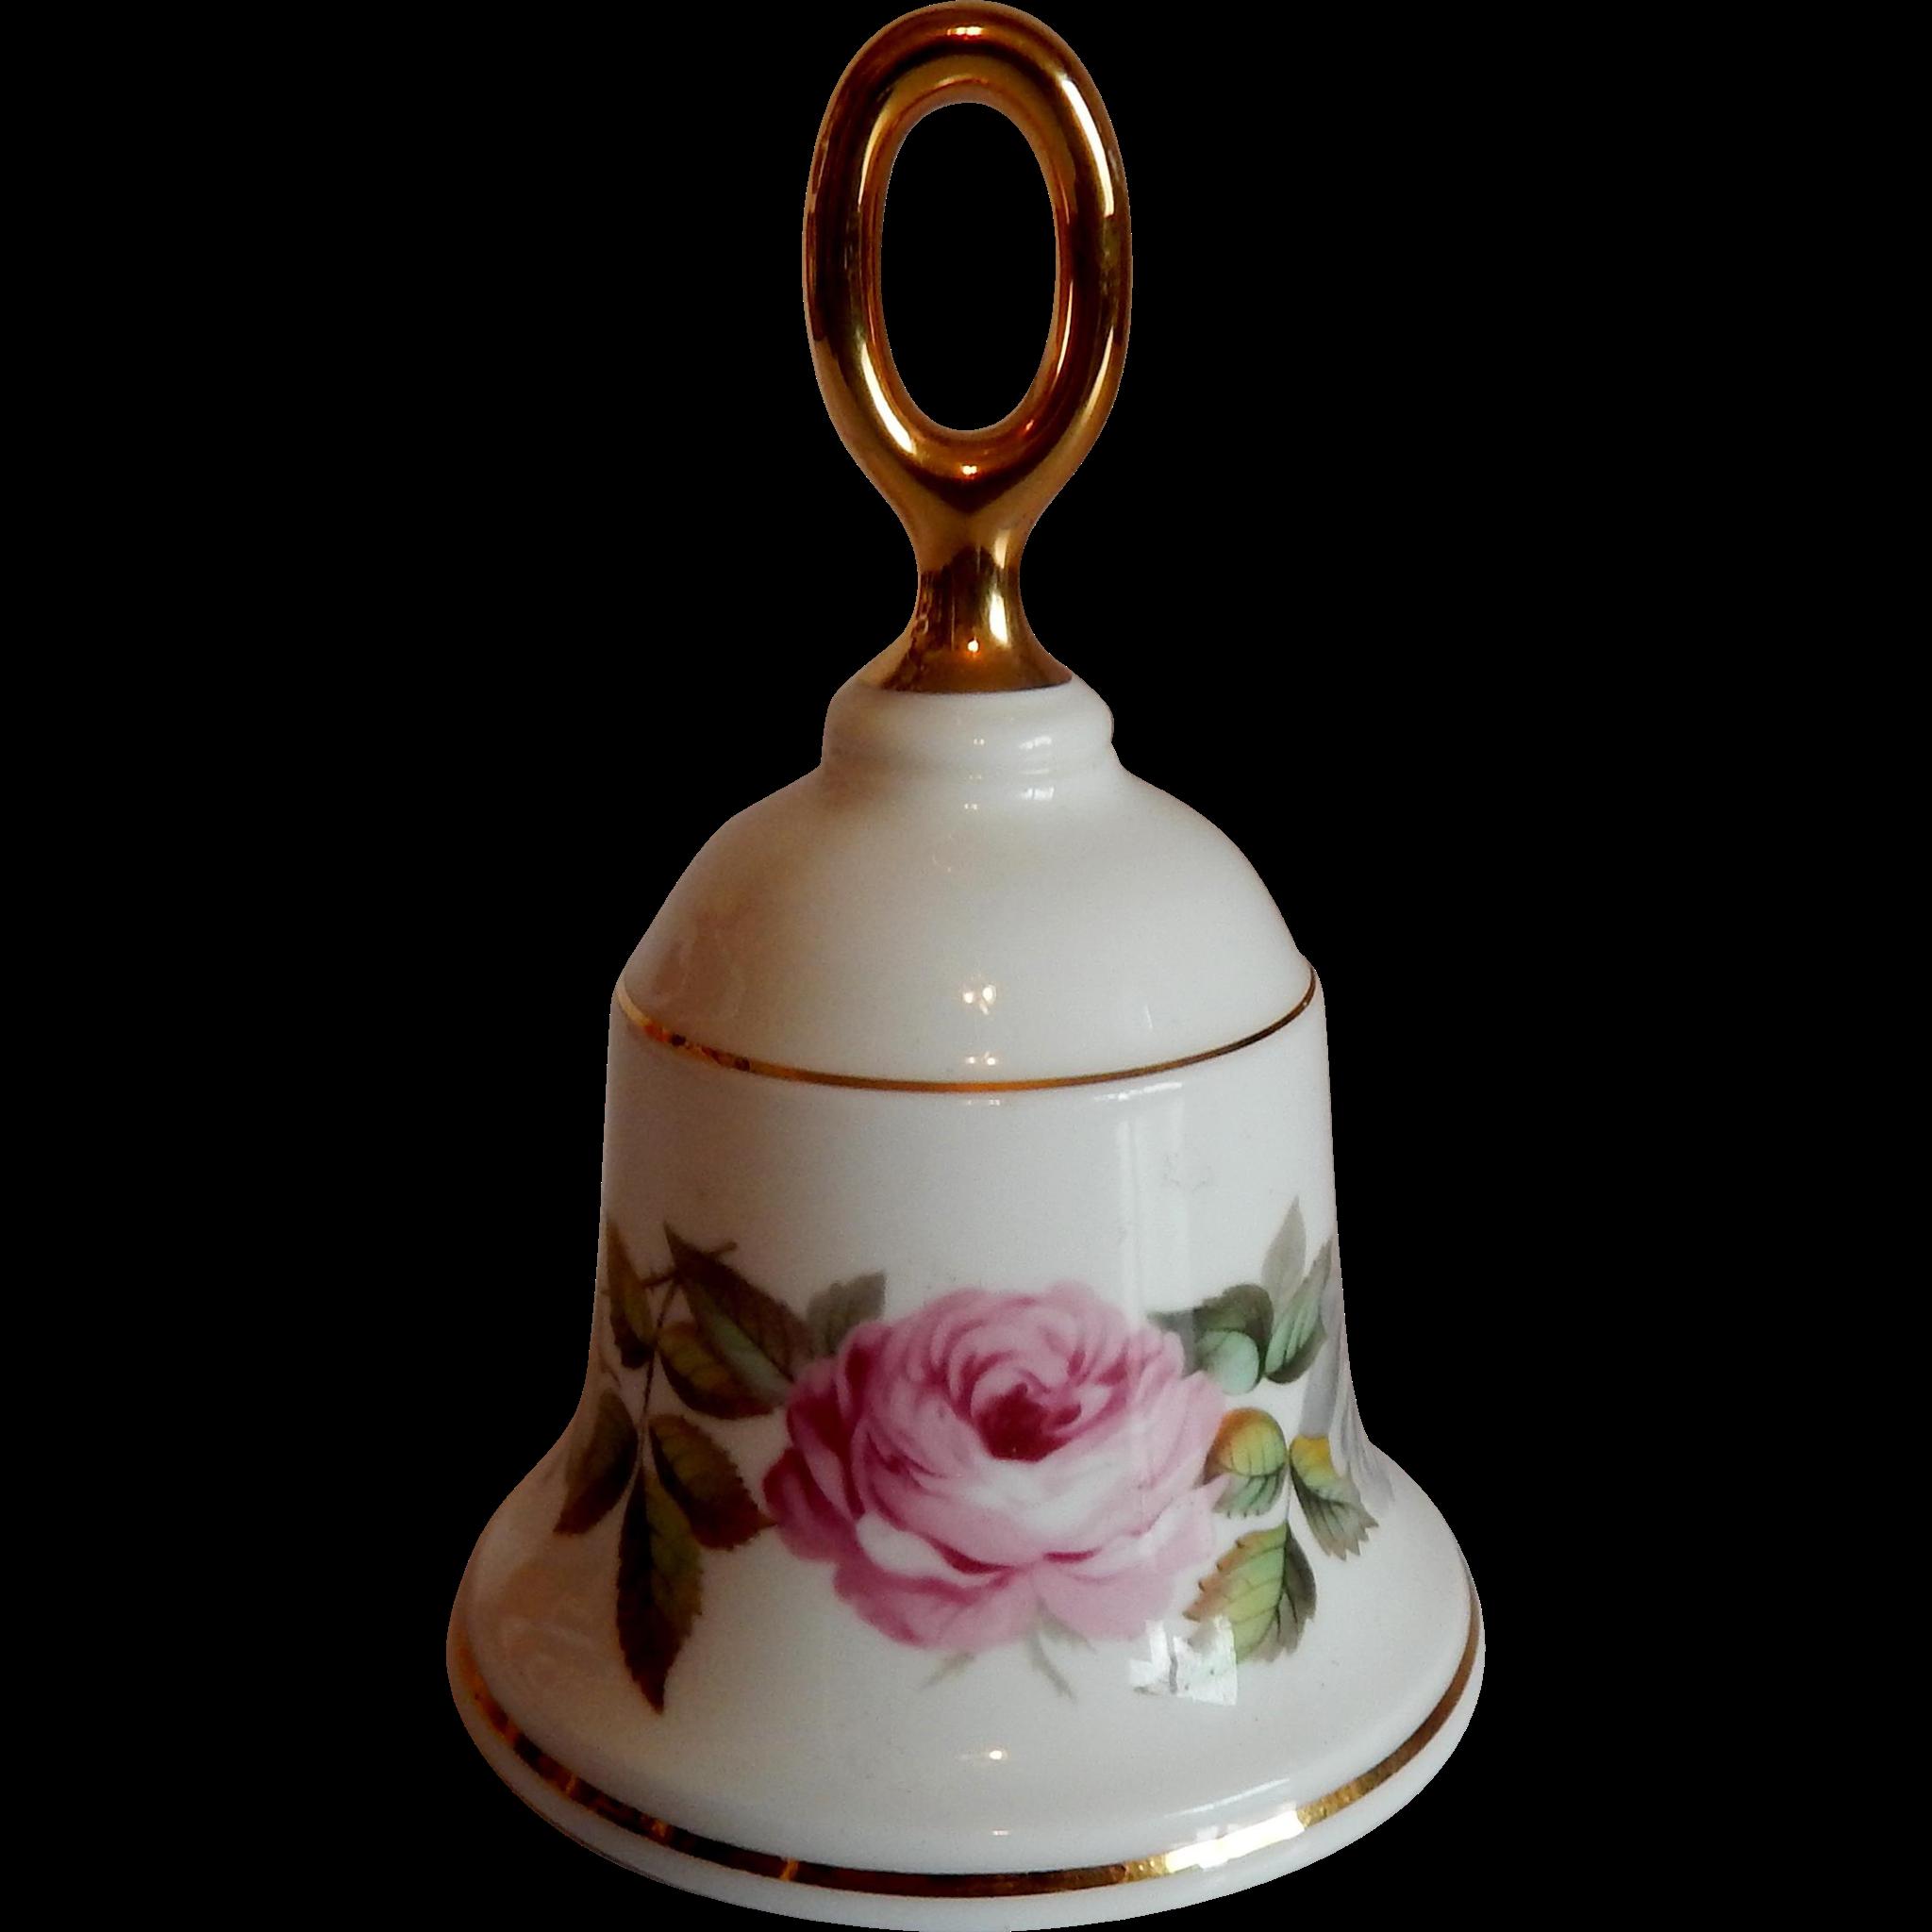 Royal Worcester Danbury Mint Porcelain Bell